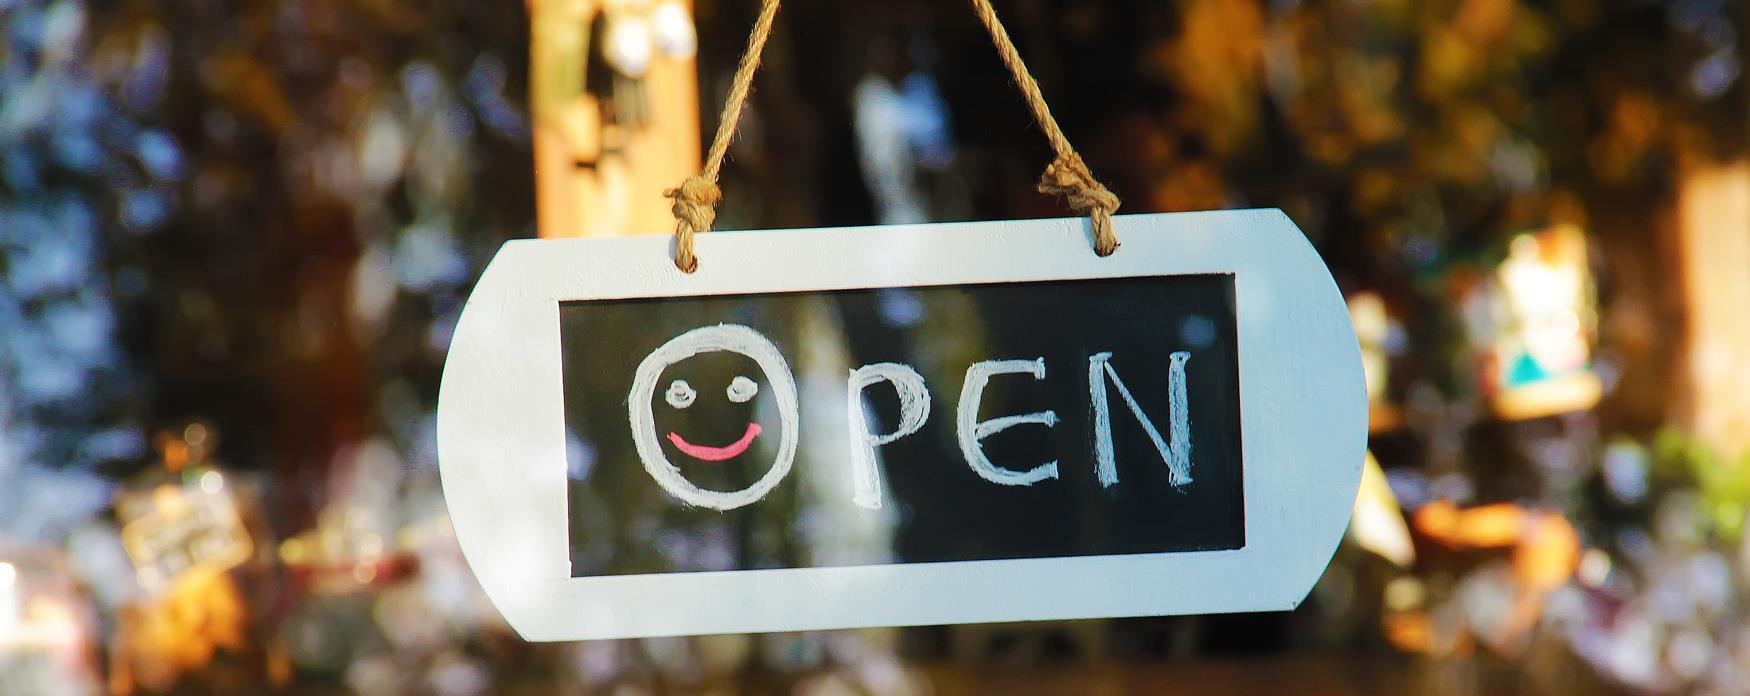 Smiley face Open sign